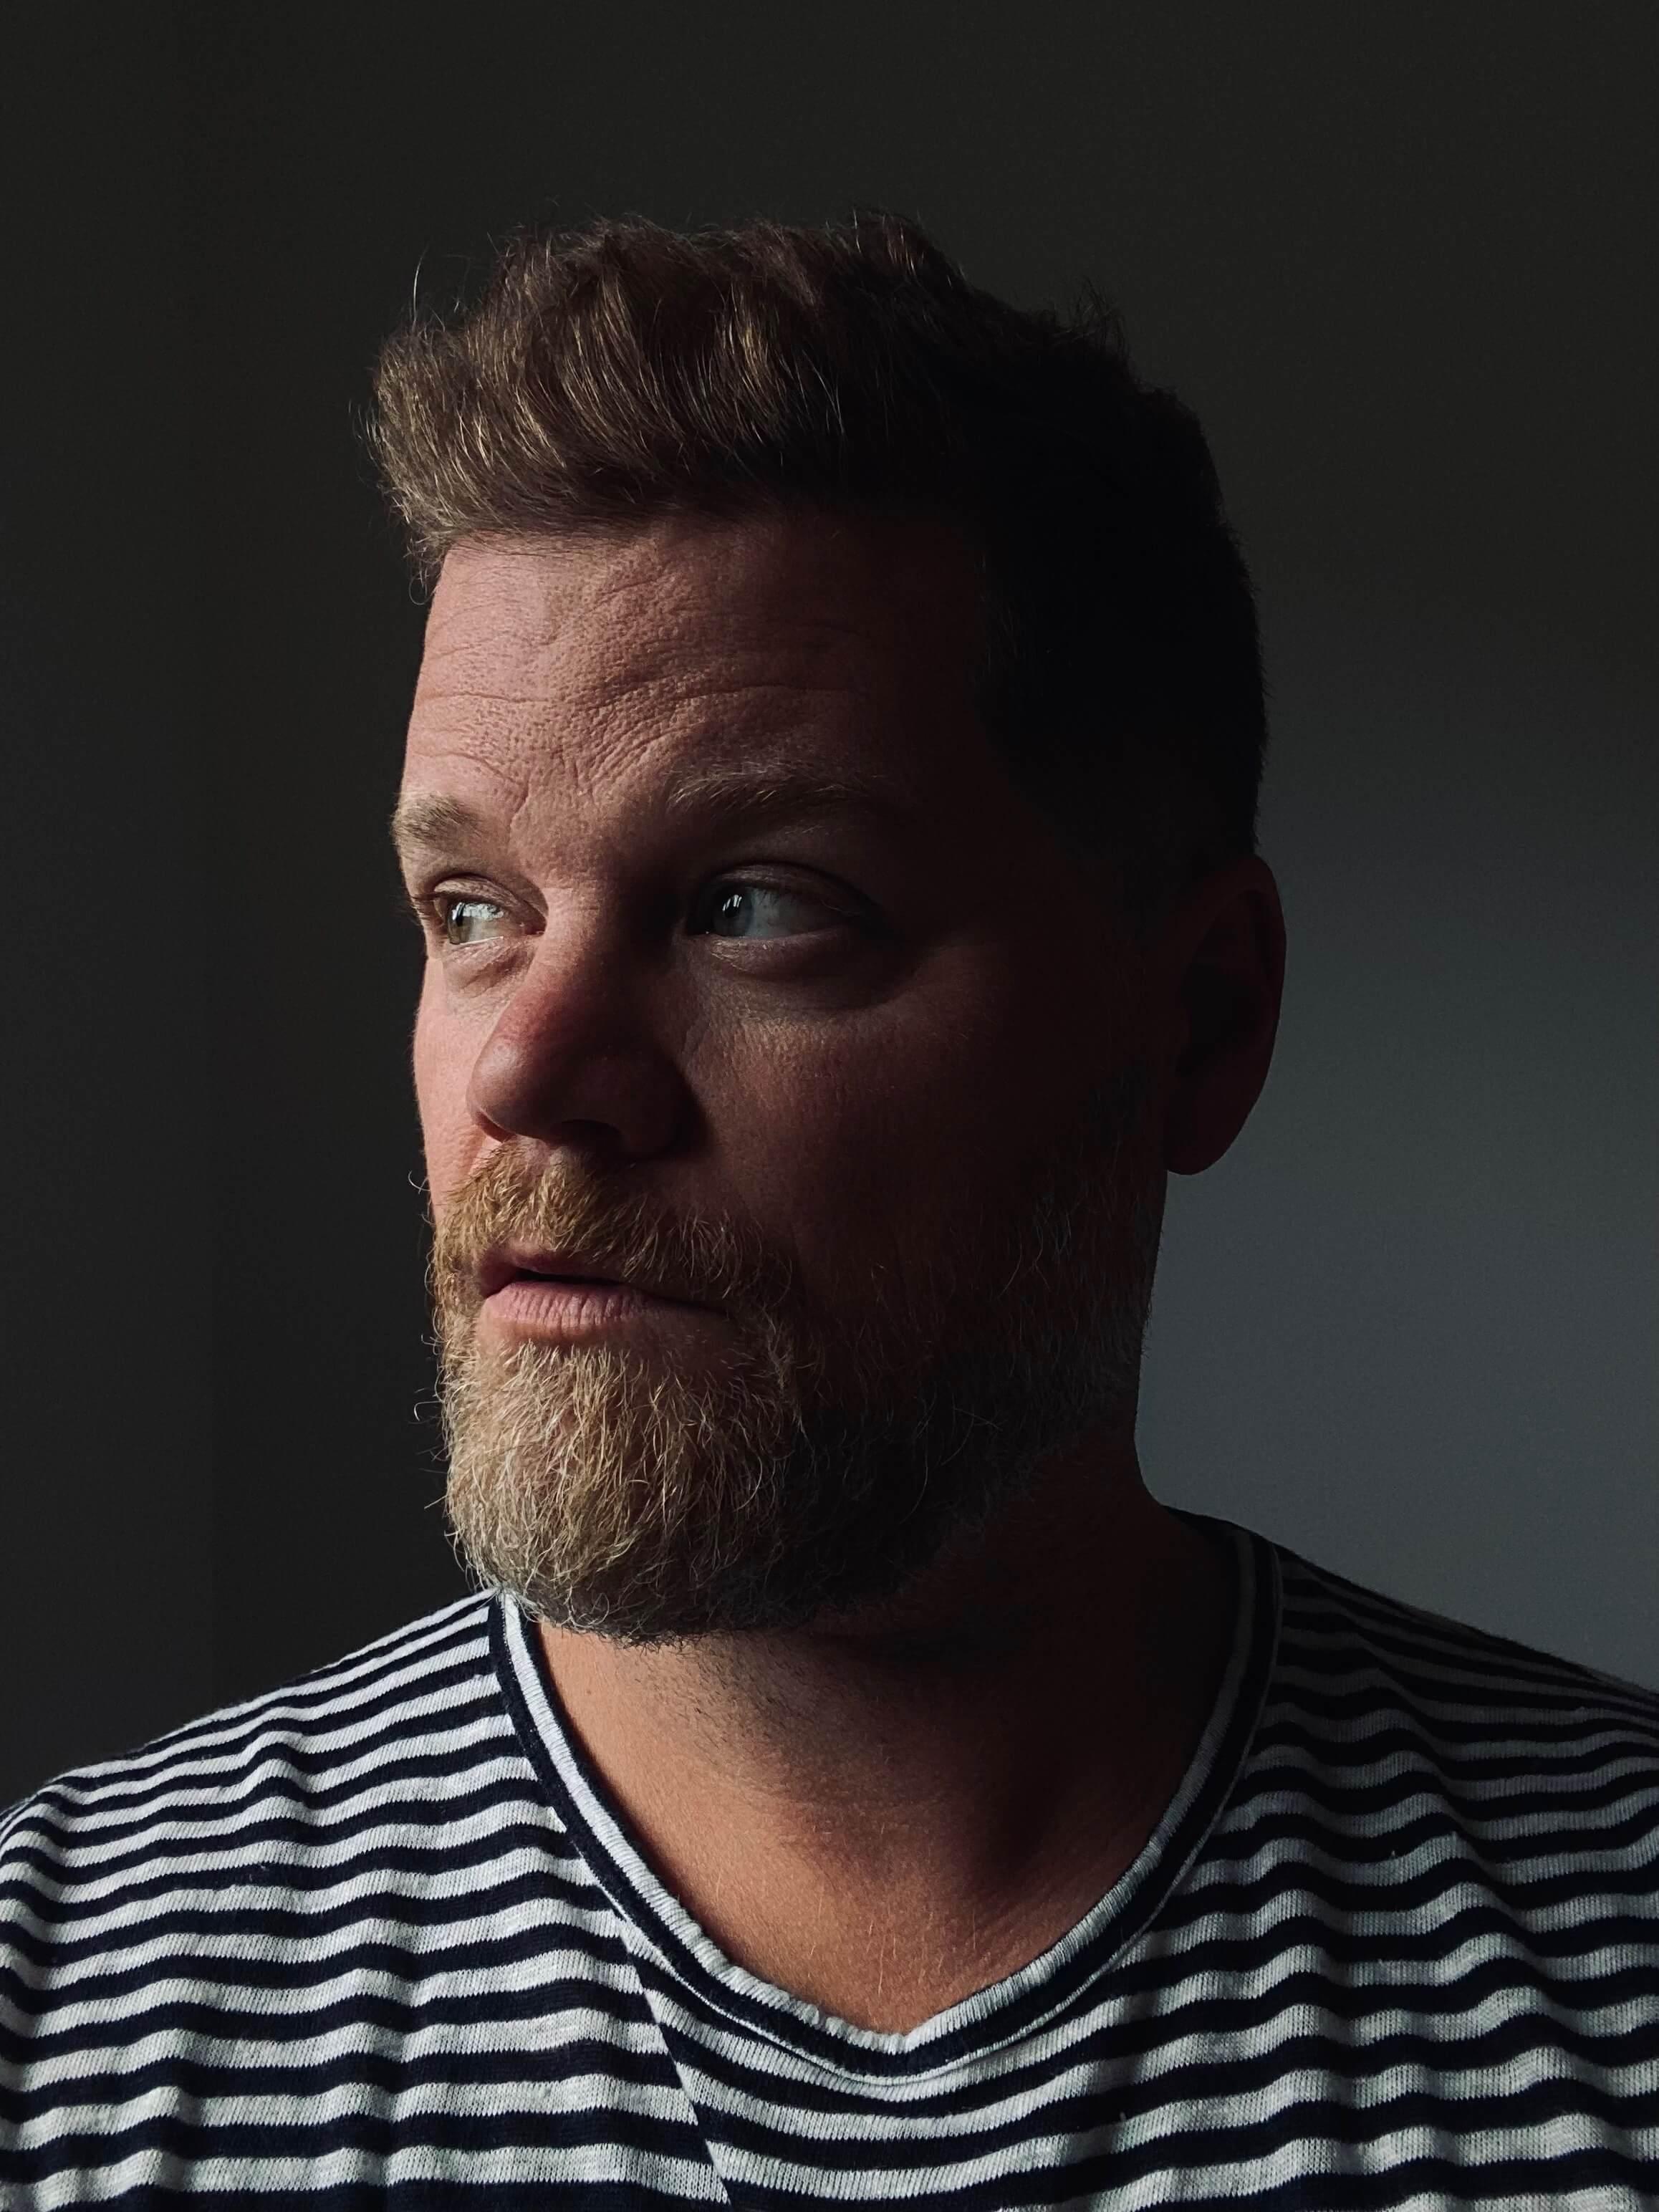 Scott Erickson – artist, author, performance speaker, and creative curate.